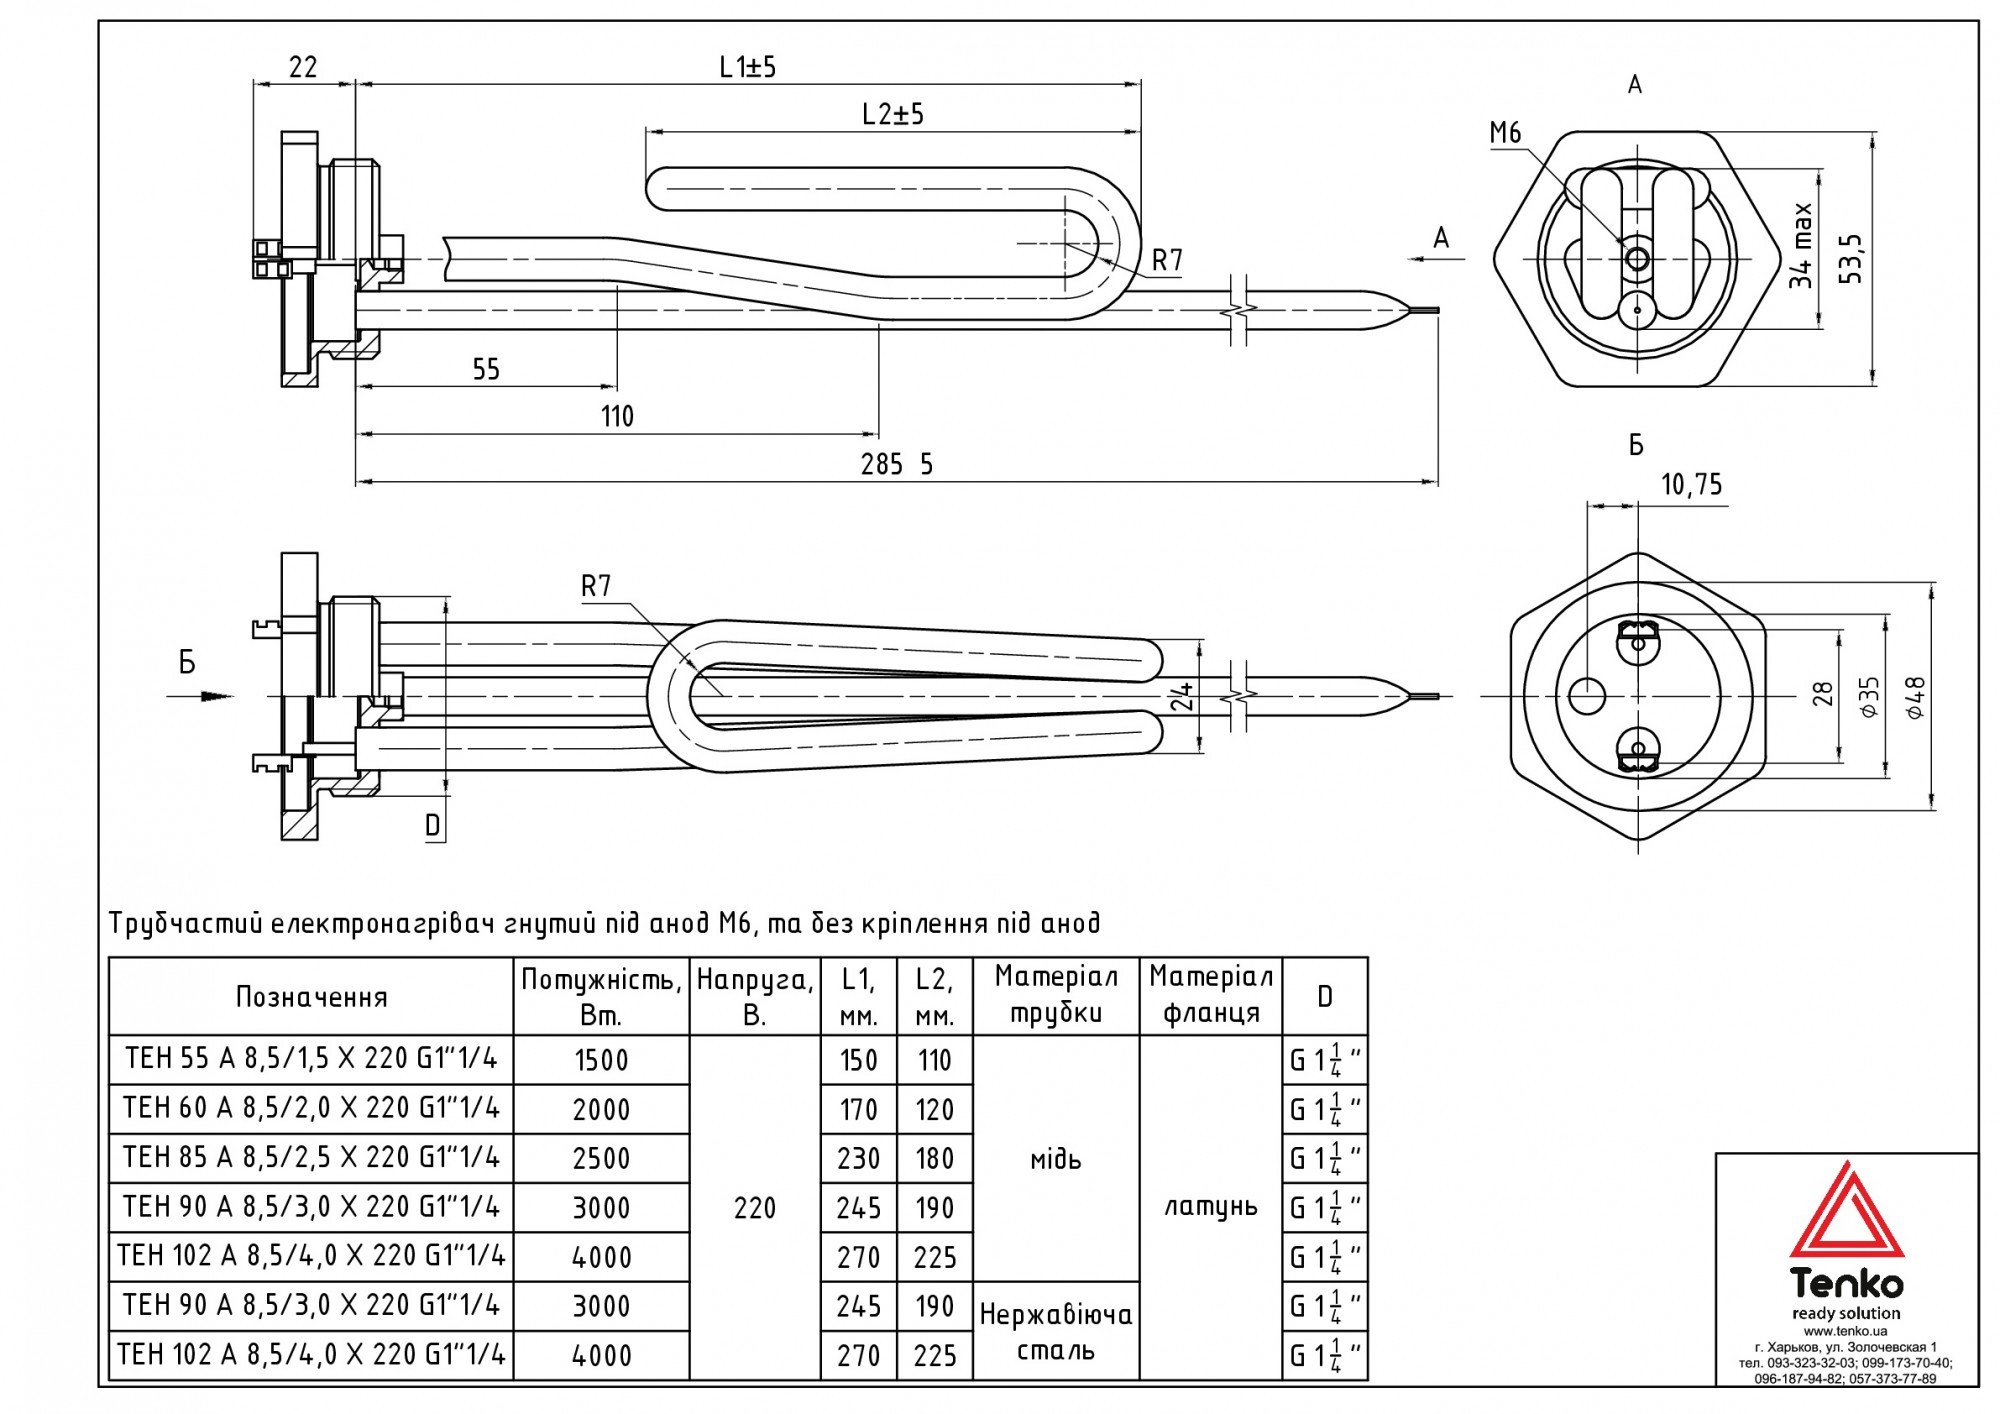 ТЭН Тенко гнутый под анод М6 чертеж рис.1